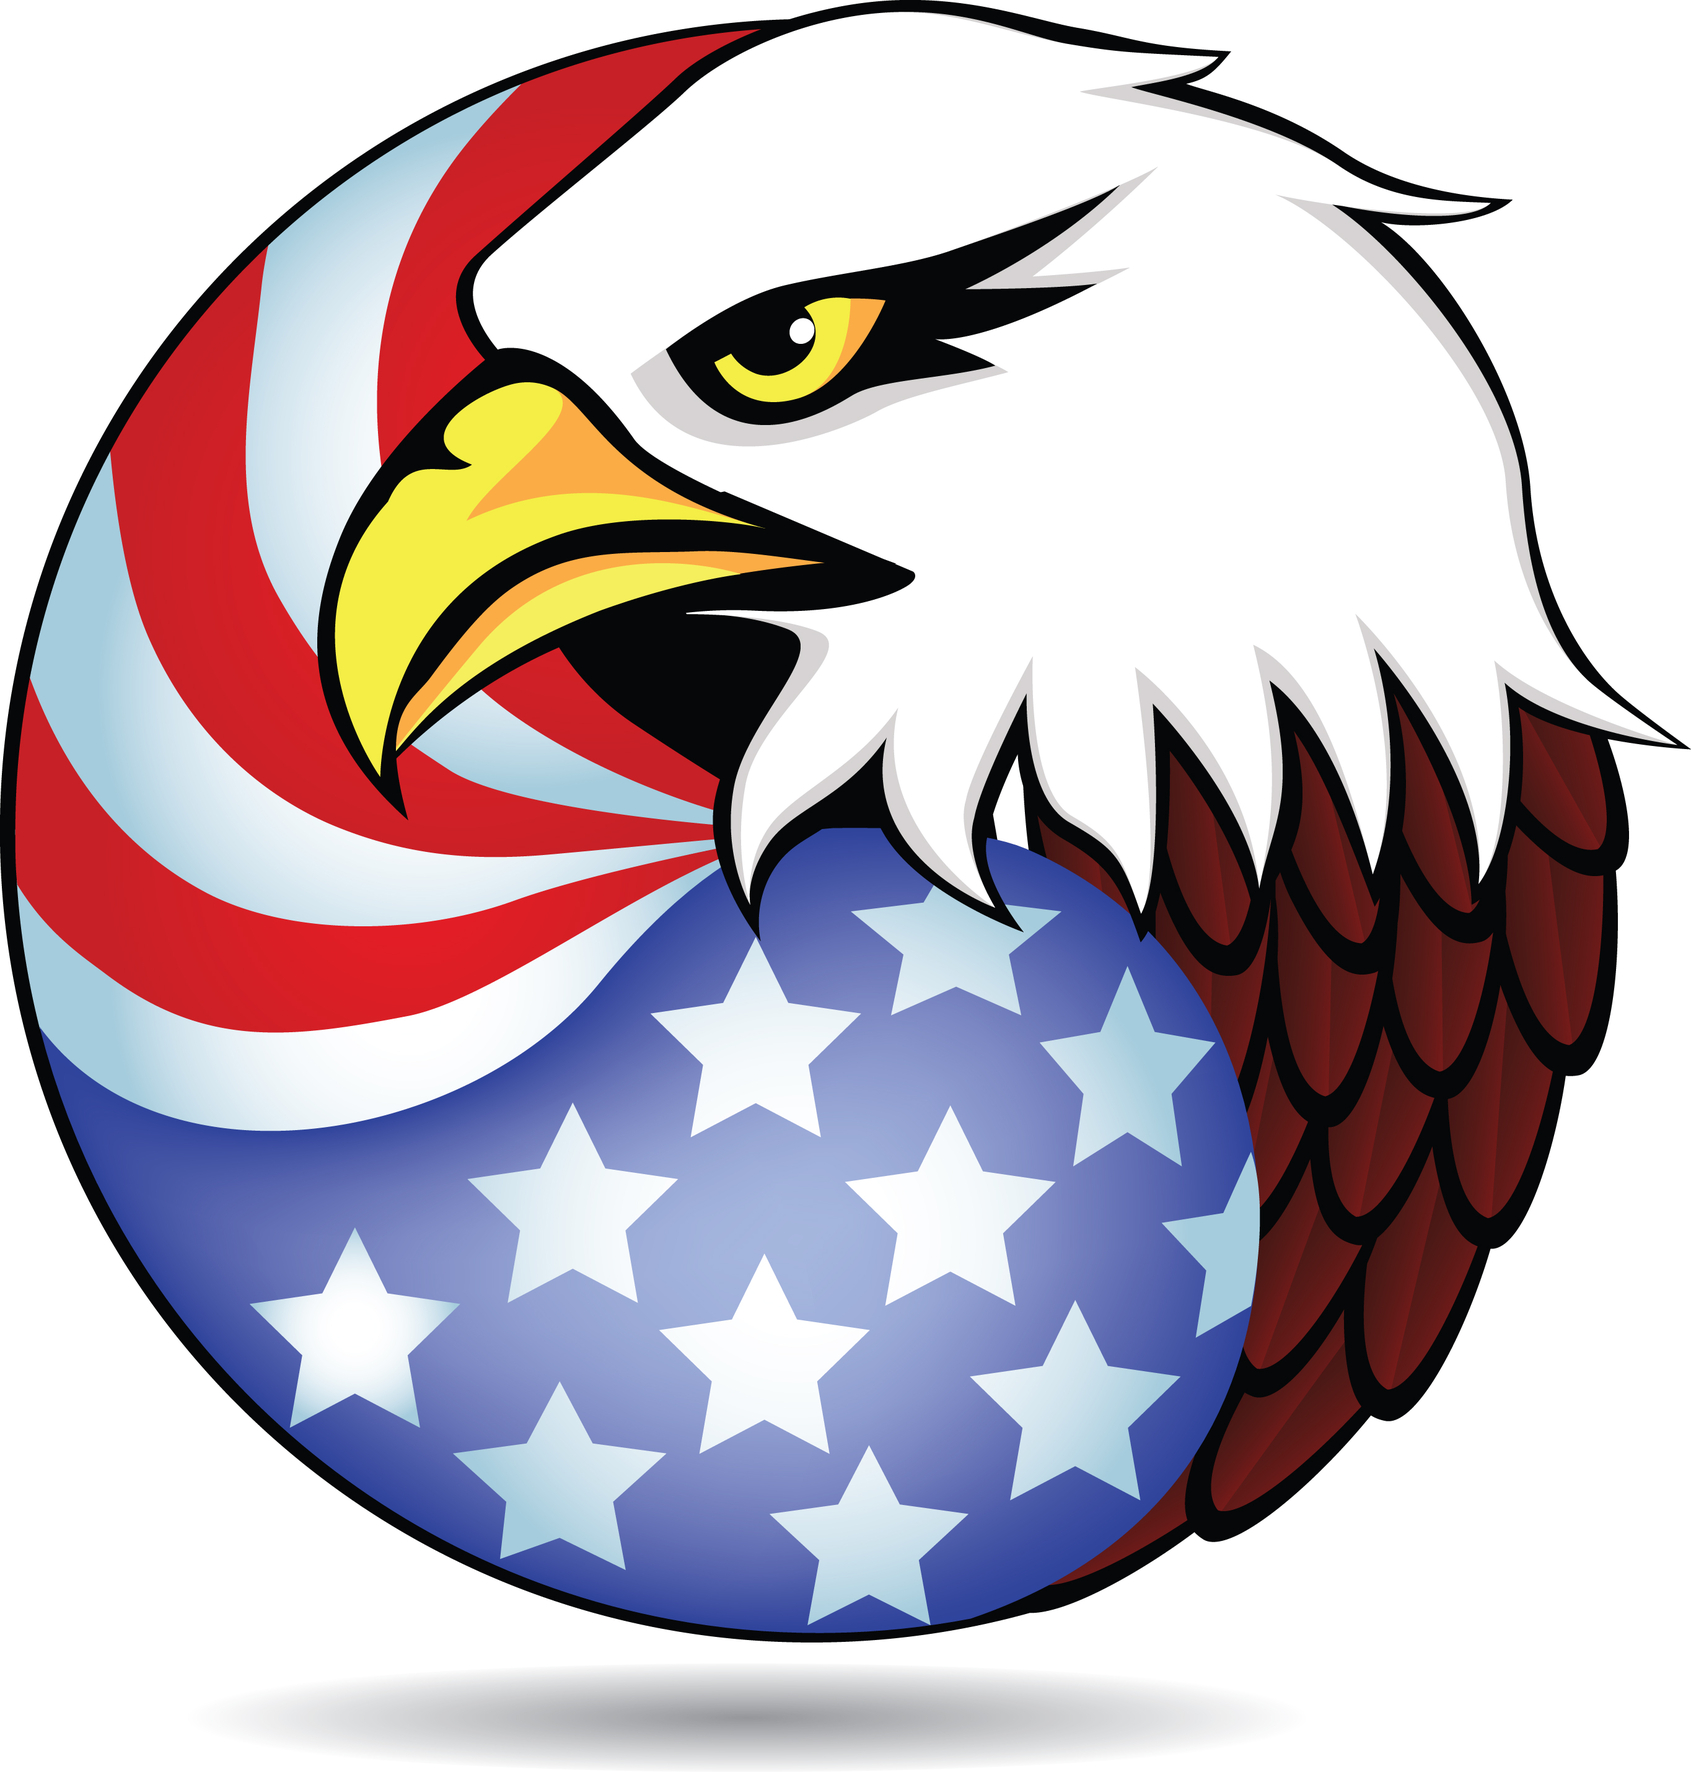 1691x1772 Eagle Clipart Flag Clip Art